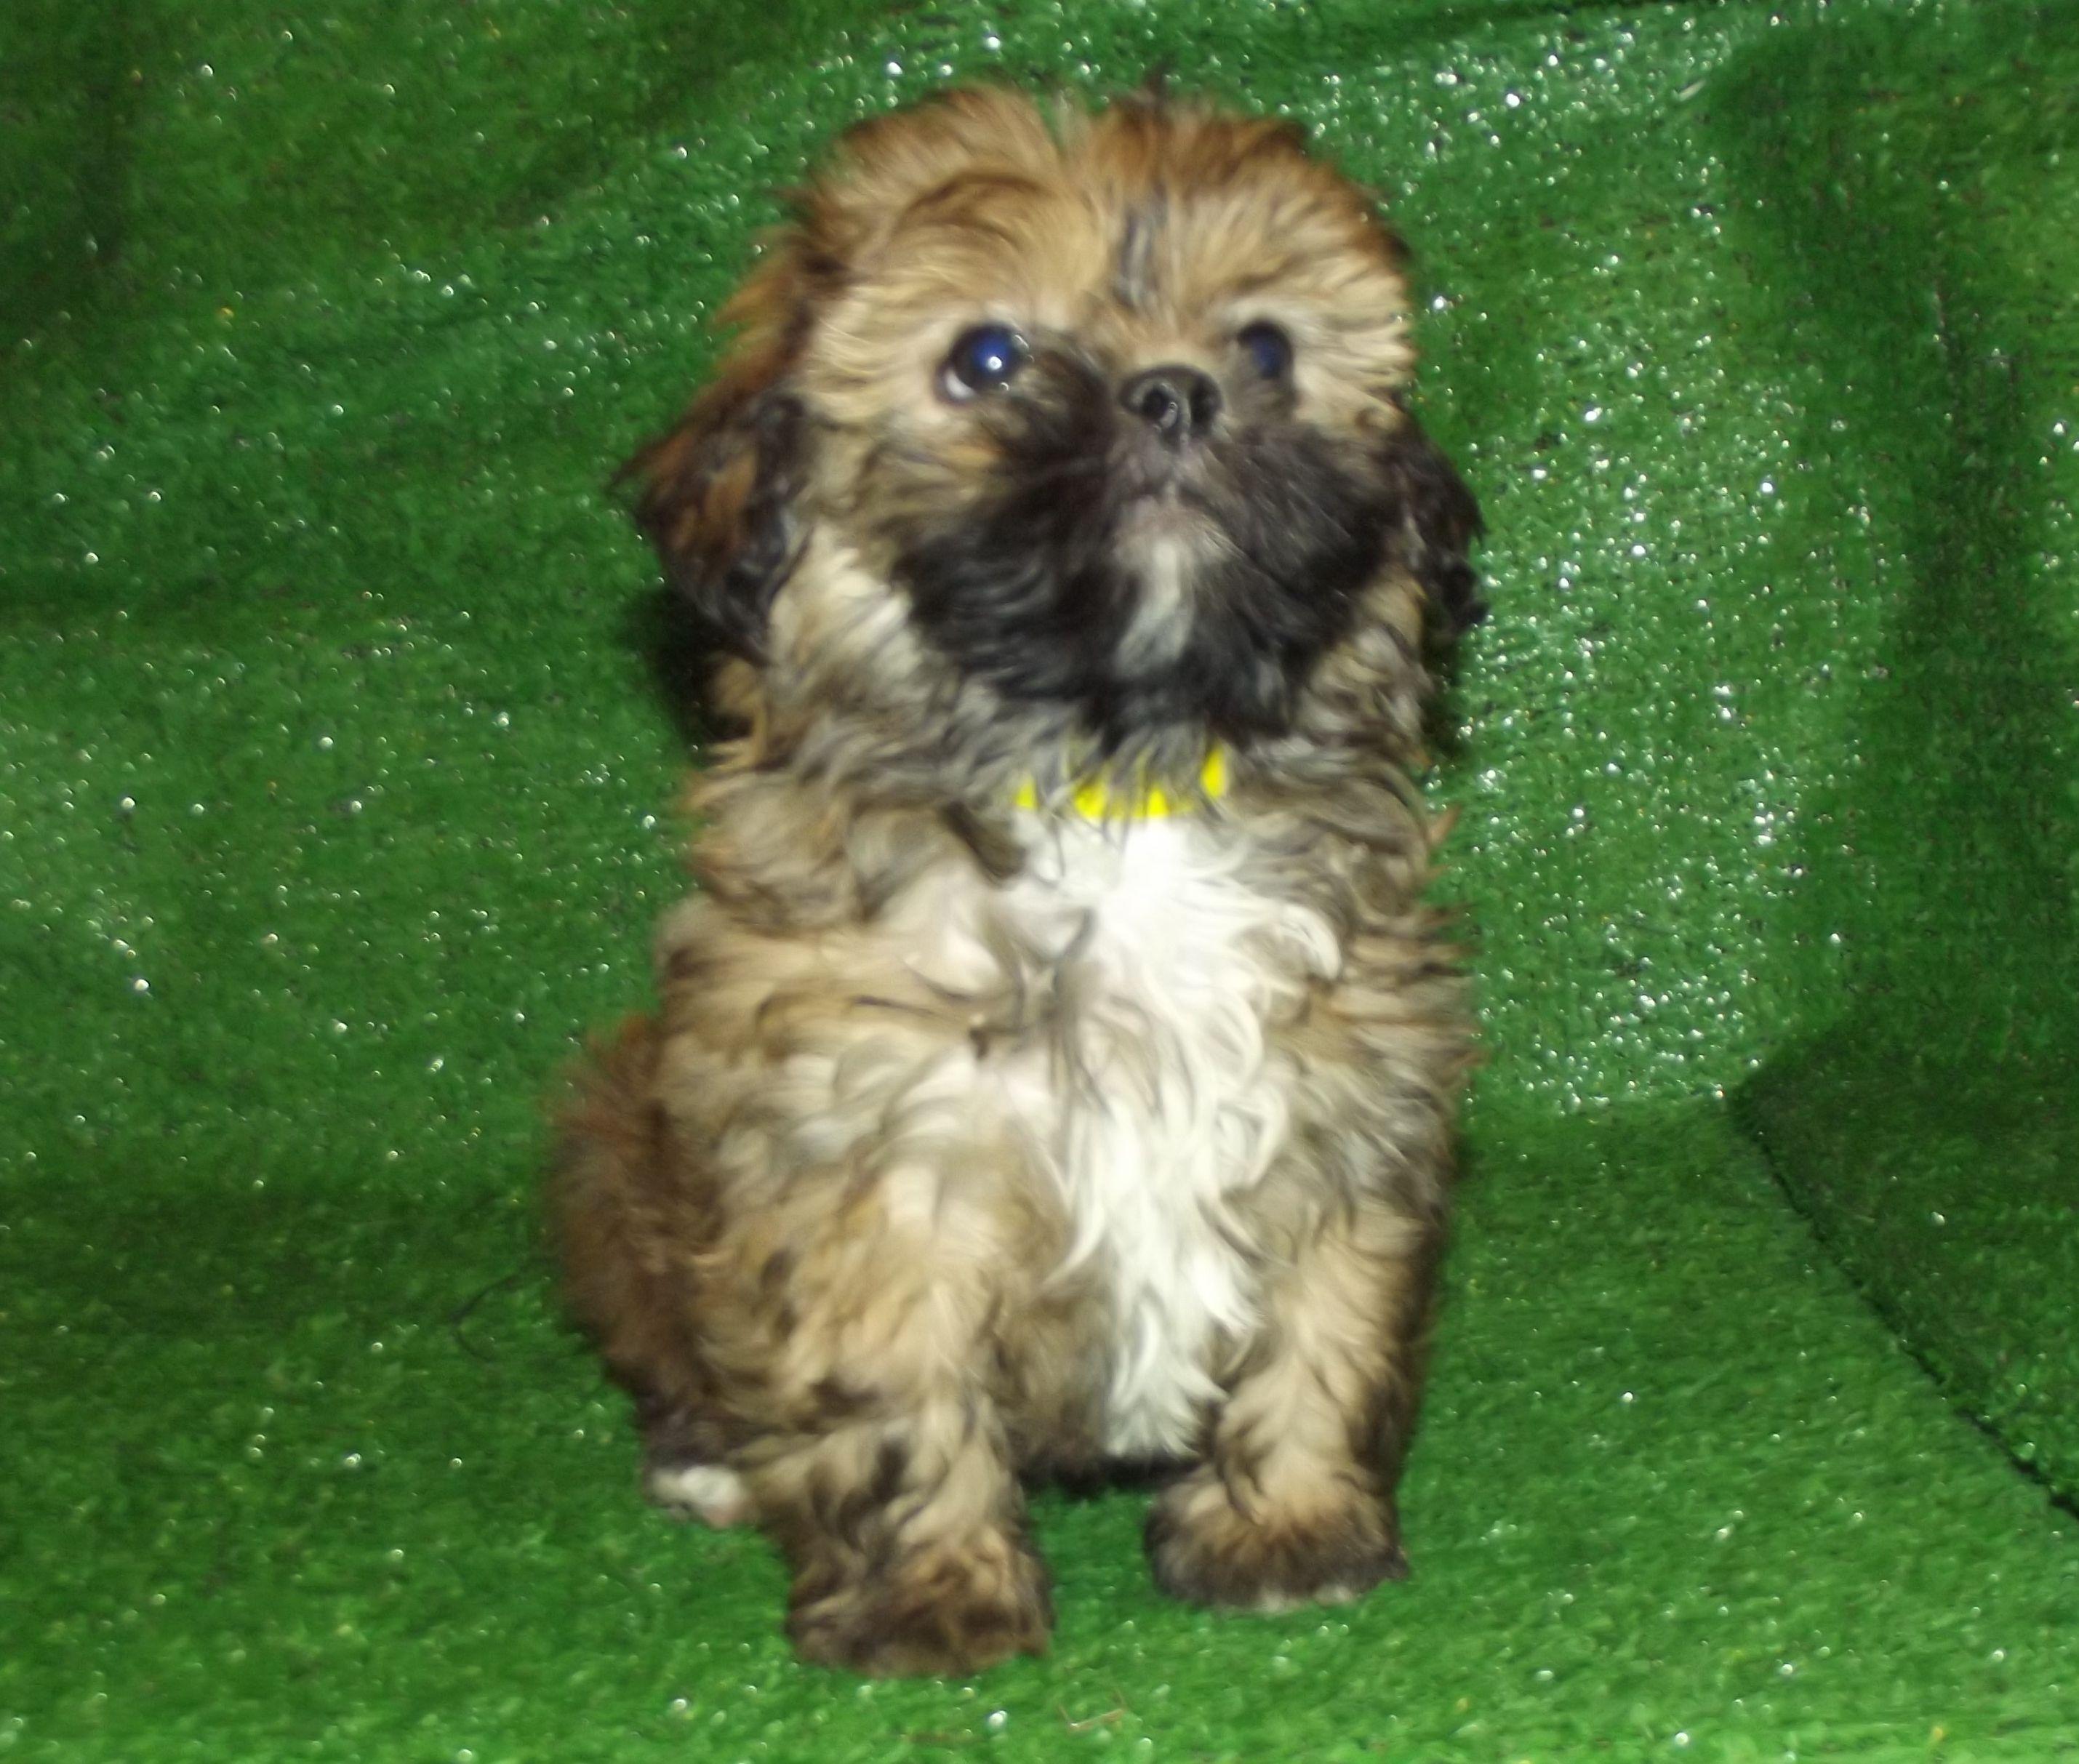 Shorkie (Shih Tzu X Yorkshire Terrier). Small nonshedding